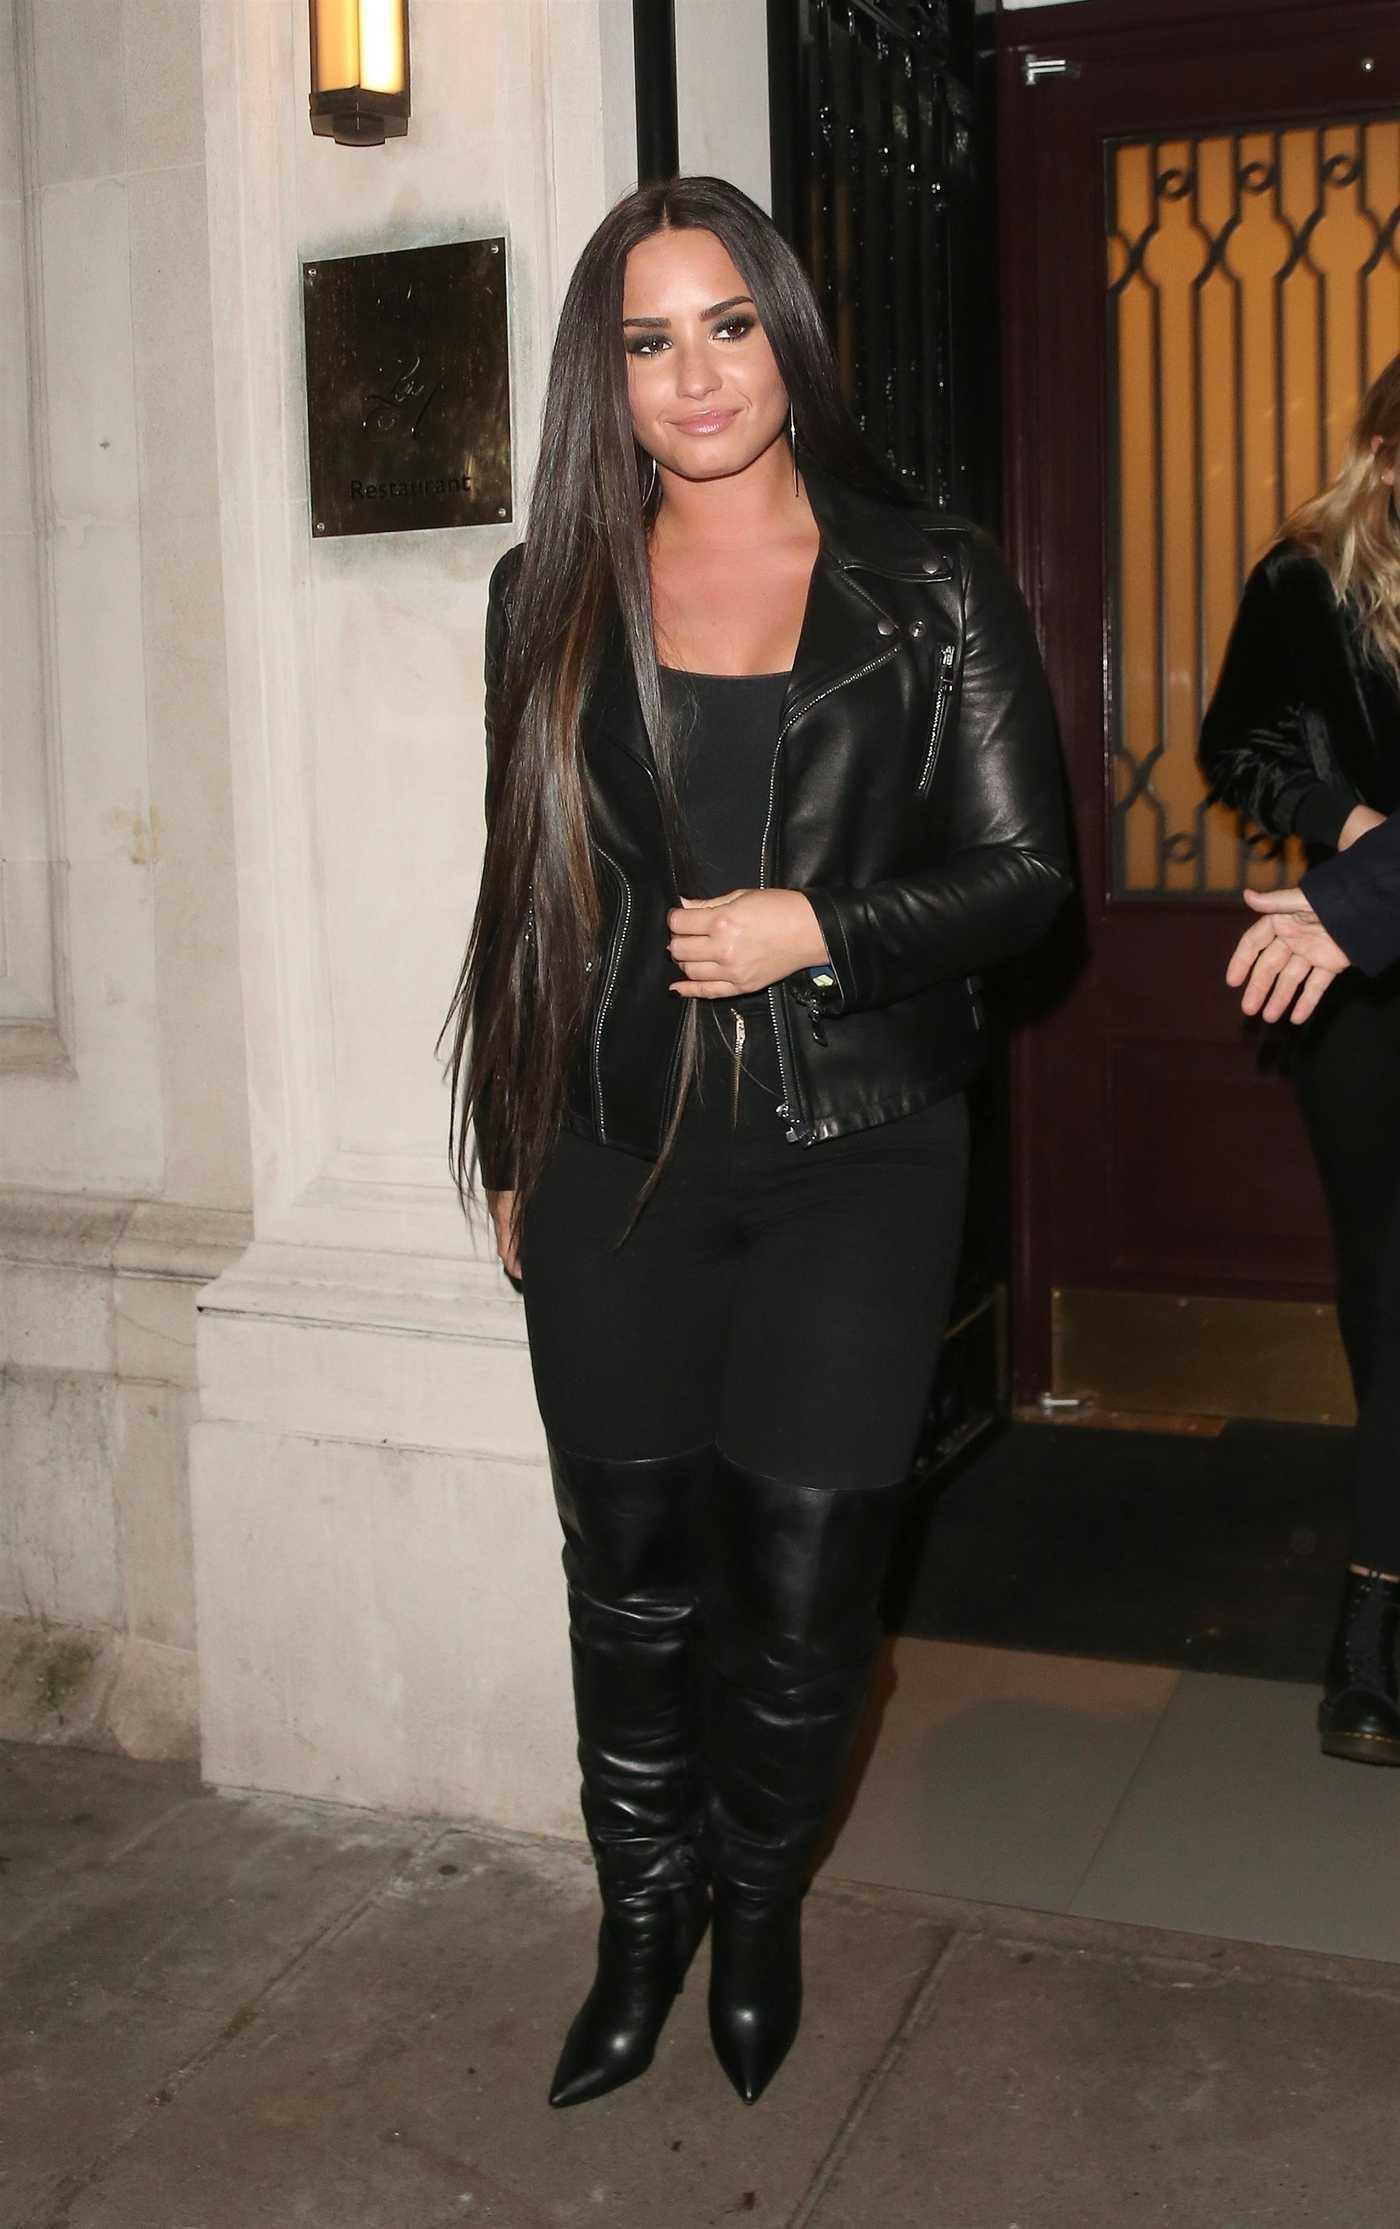 Demi Lovato Leaves the Les Ambassadeurs Club in London 11/14/2017